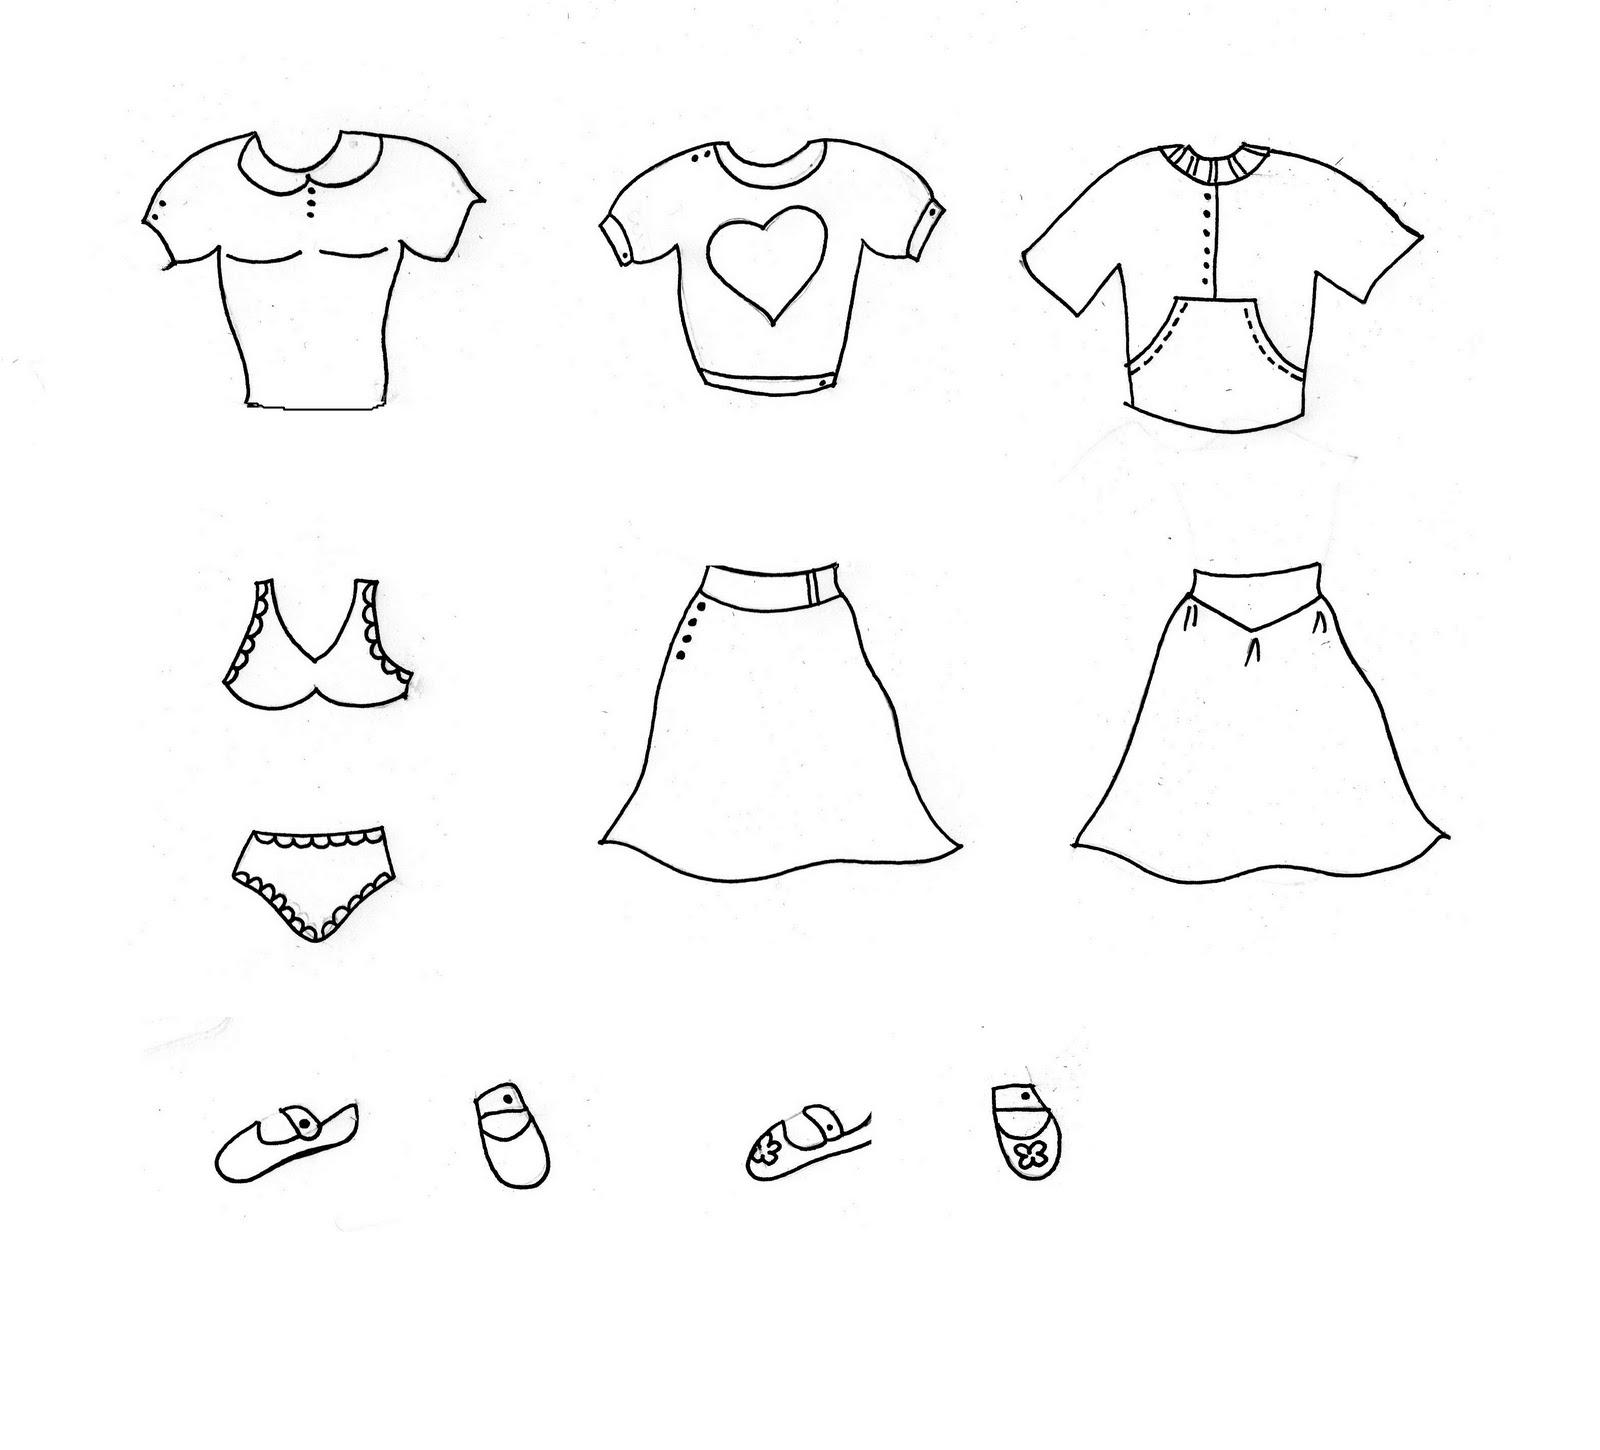 Imagen de nena para pintar sin ropa - Imagui